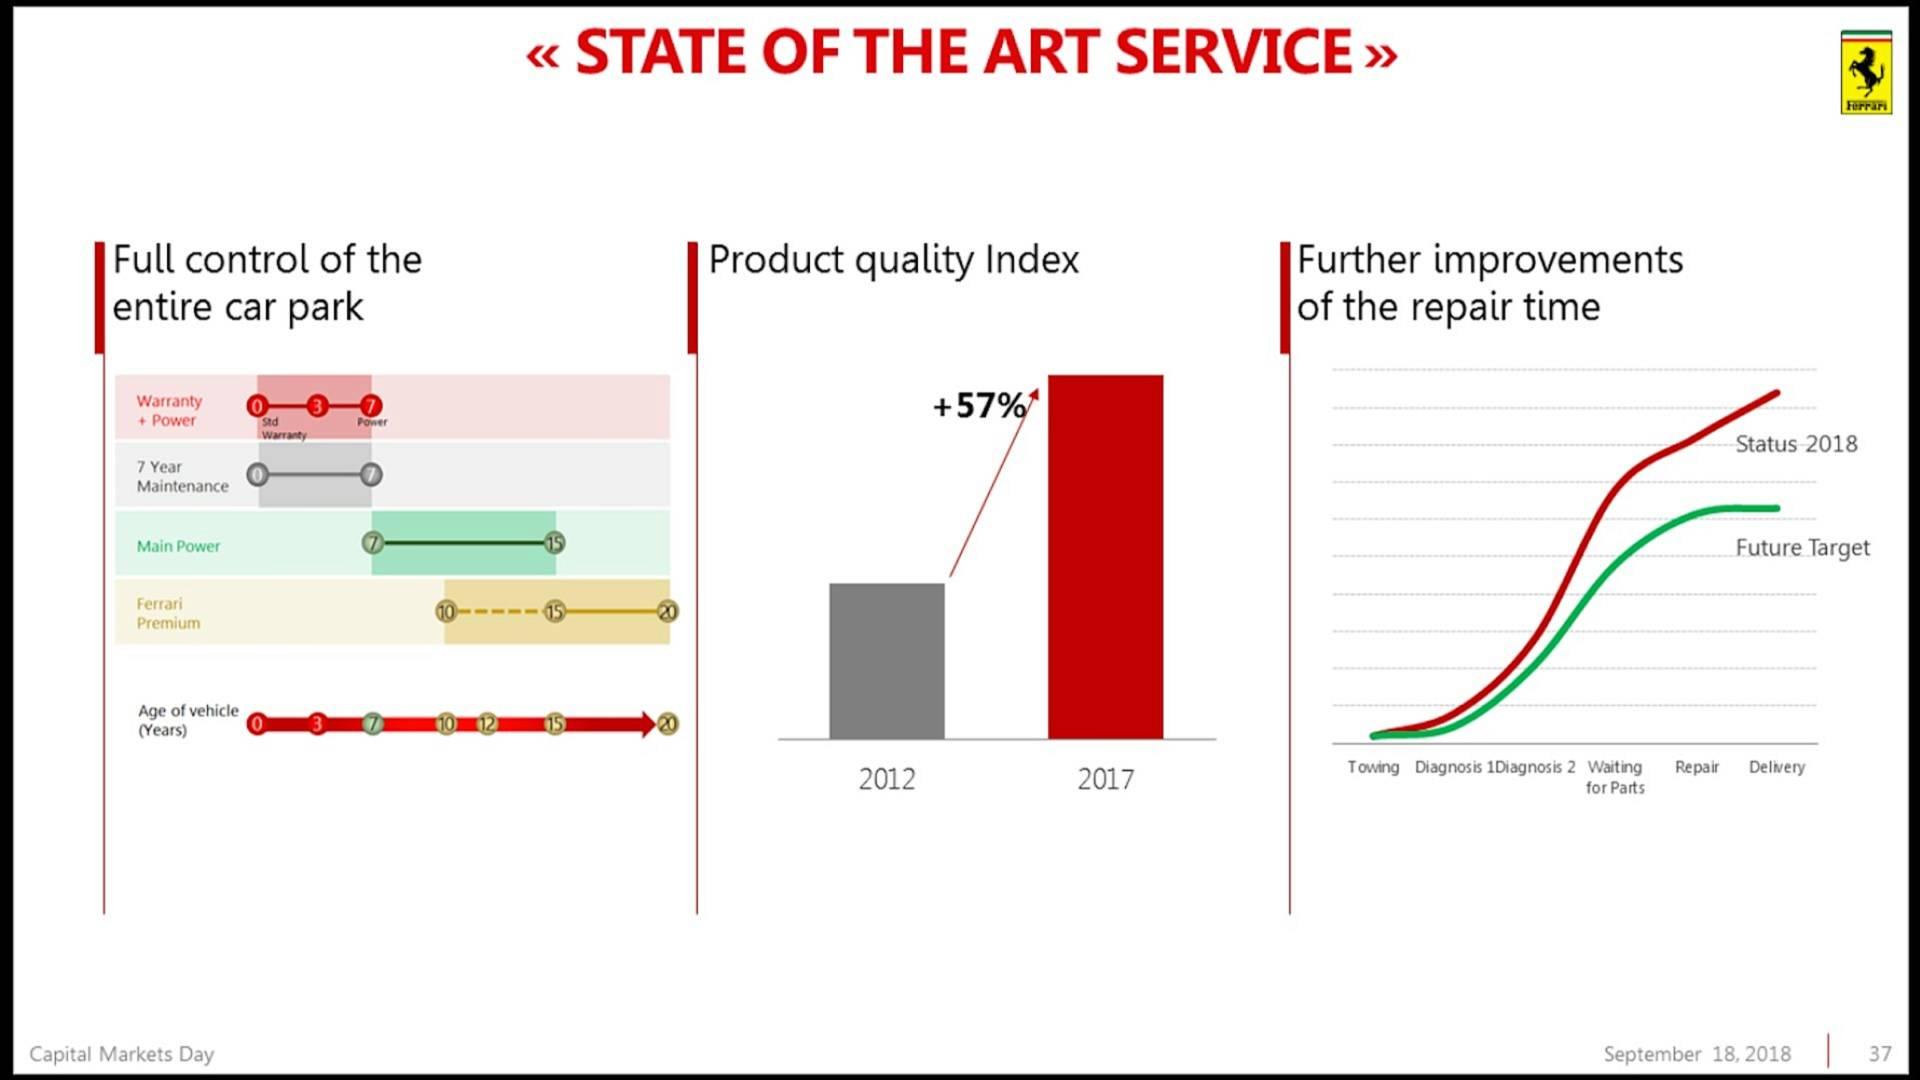 Piano Industriale Ferrari 2018-2022 (33)